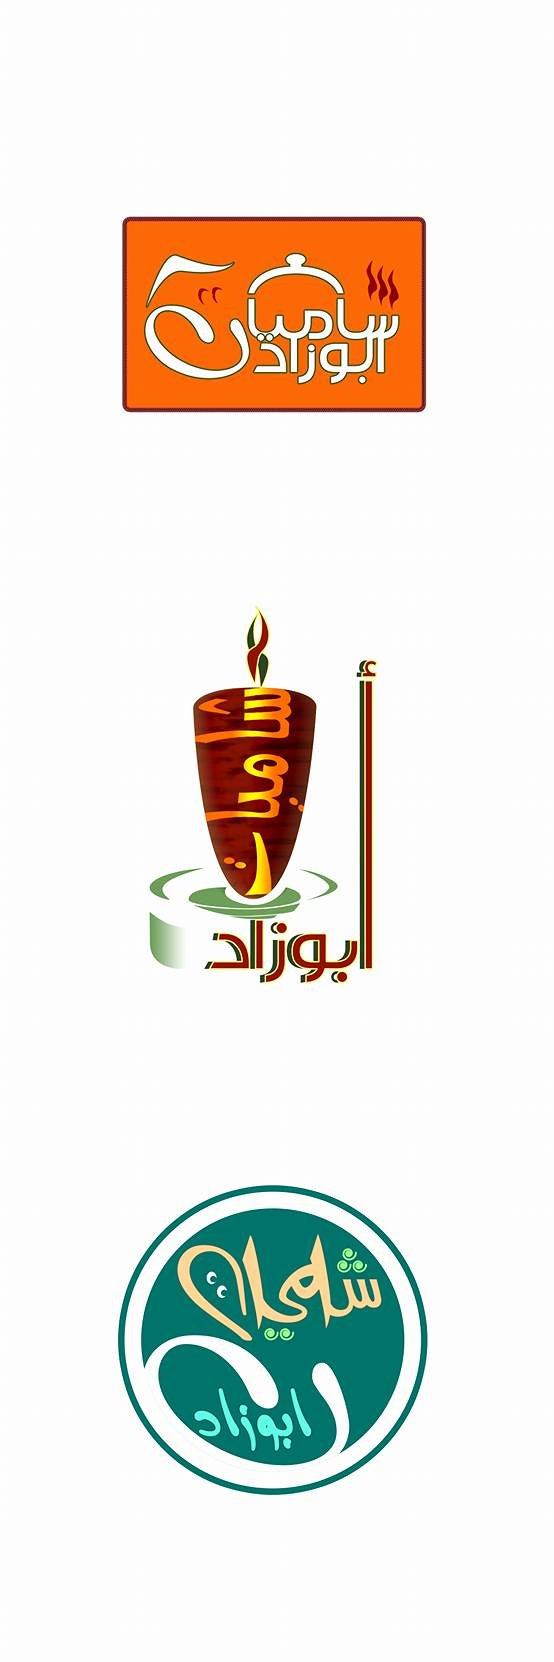 شاميات ابو زاد برومو لوجو أولي